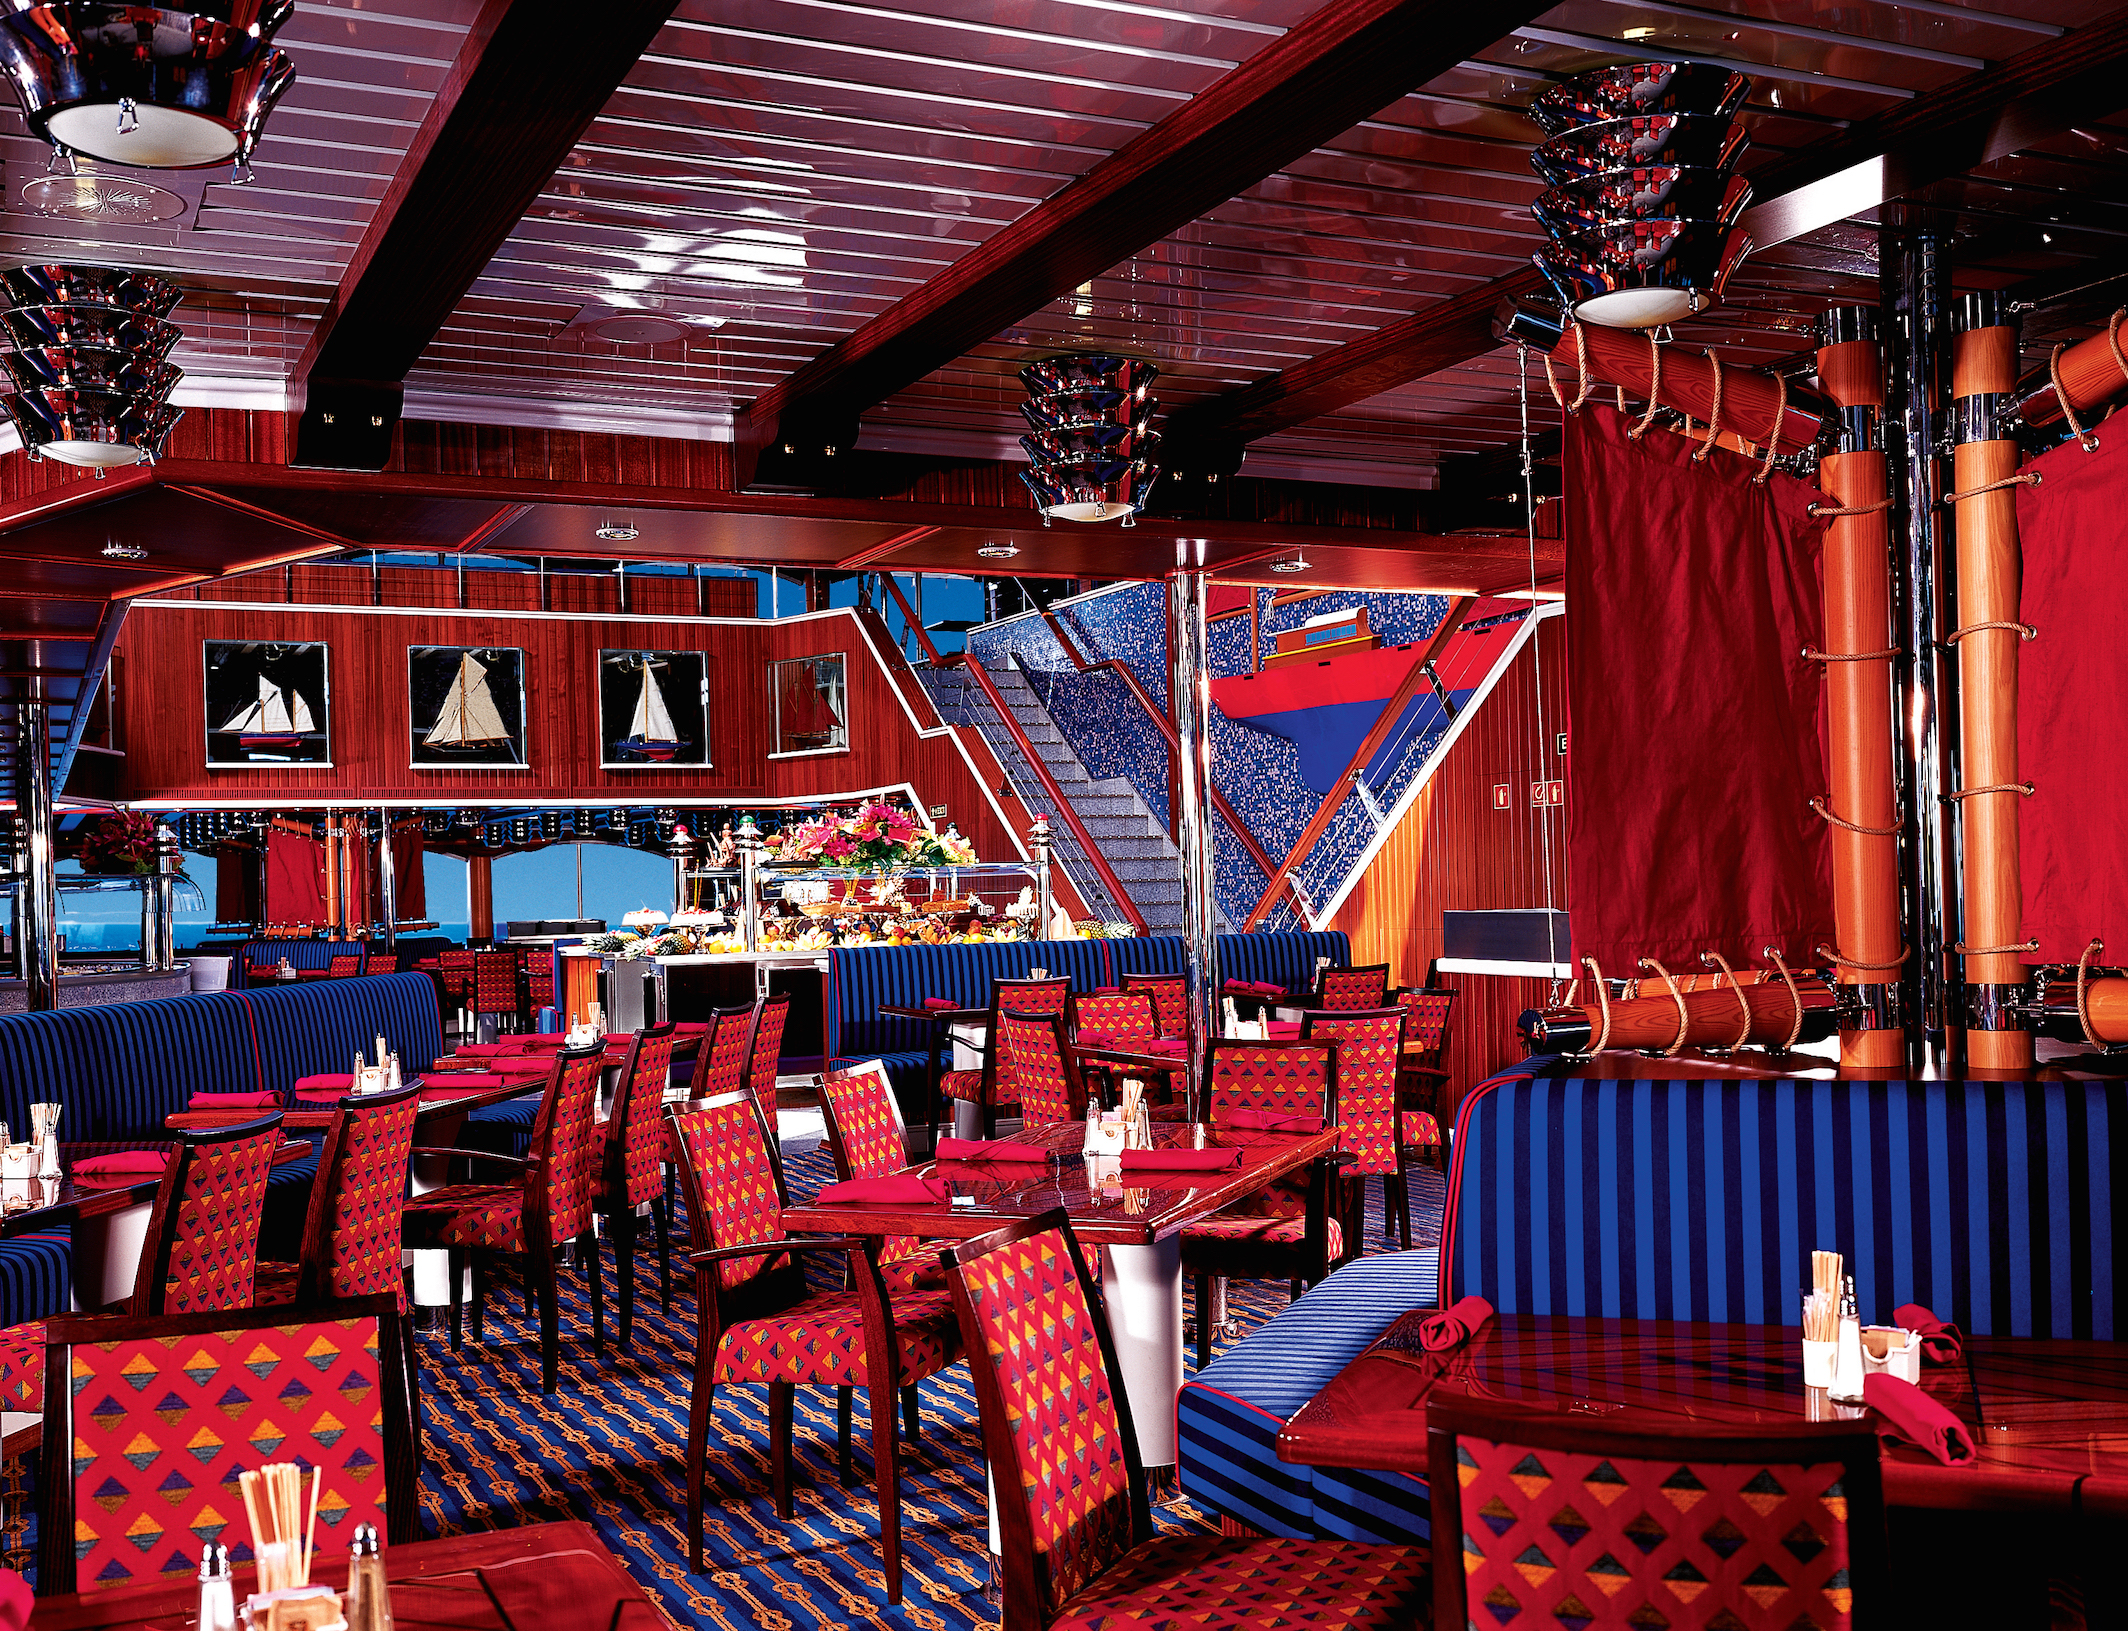 Carnival Glory Red Sail Restaurant 4.jpg